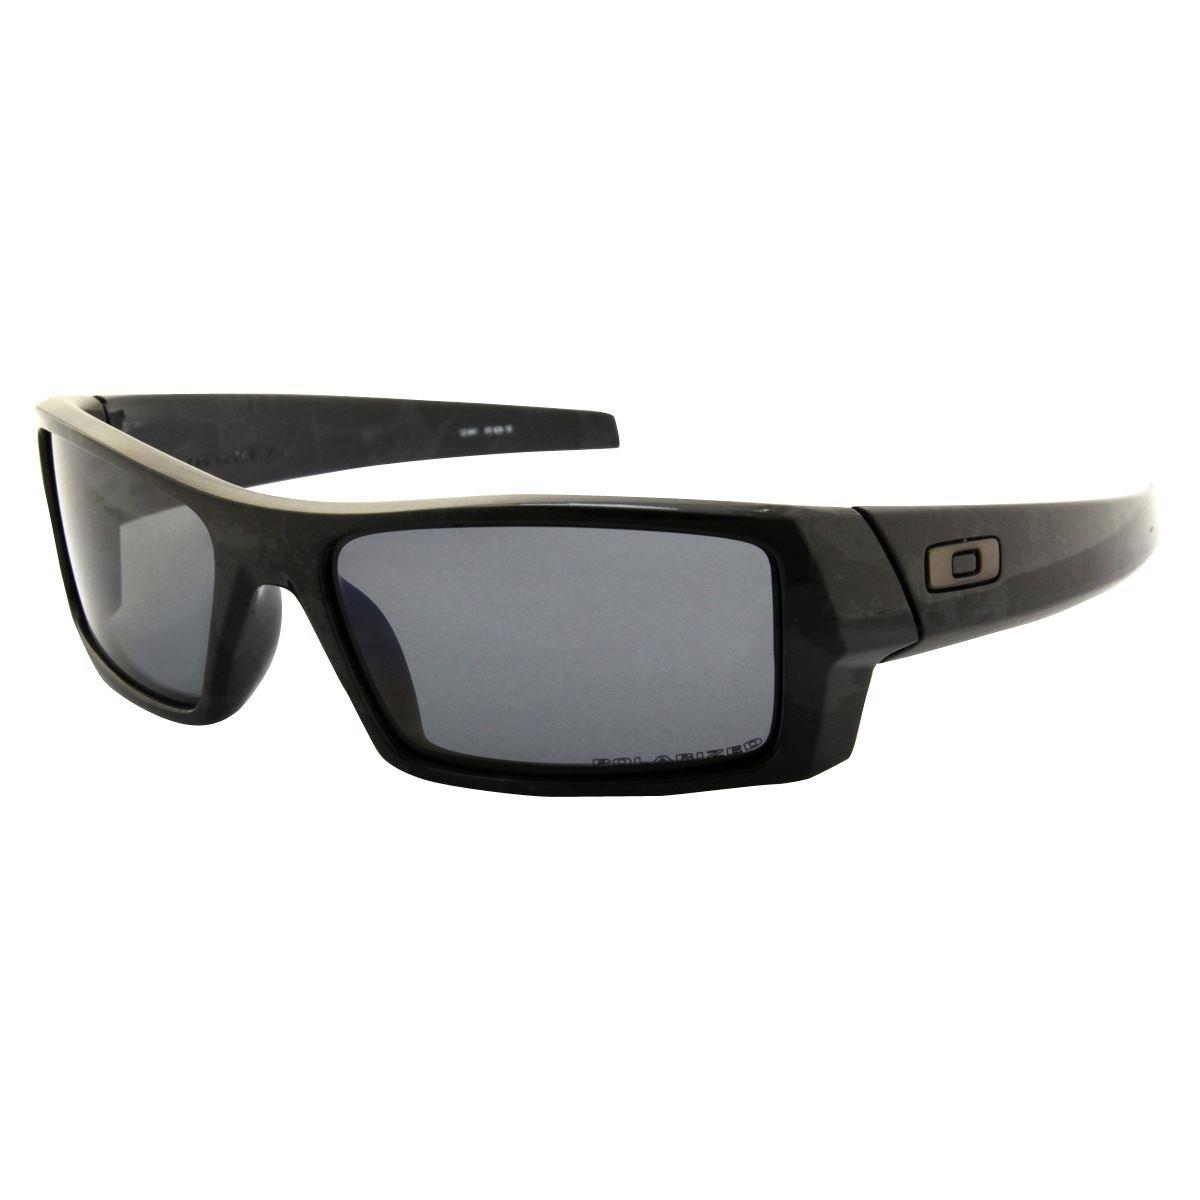 5de4ece476 Oakley Gascan Small Sunglasses